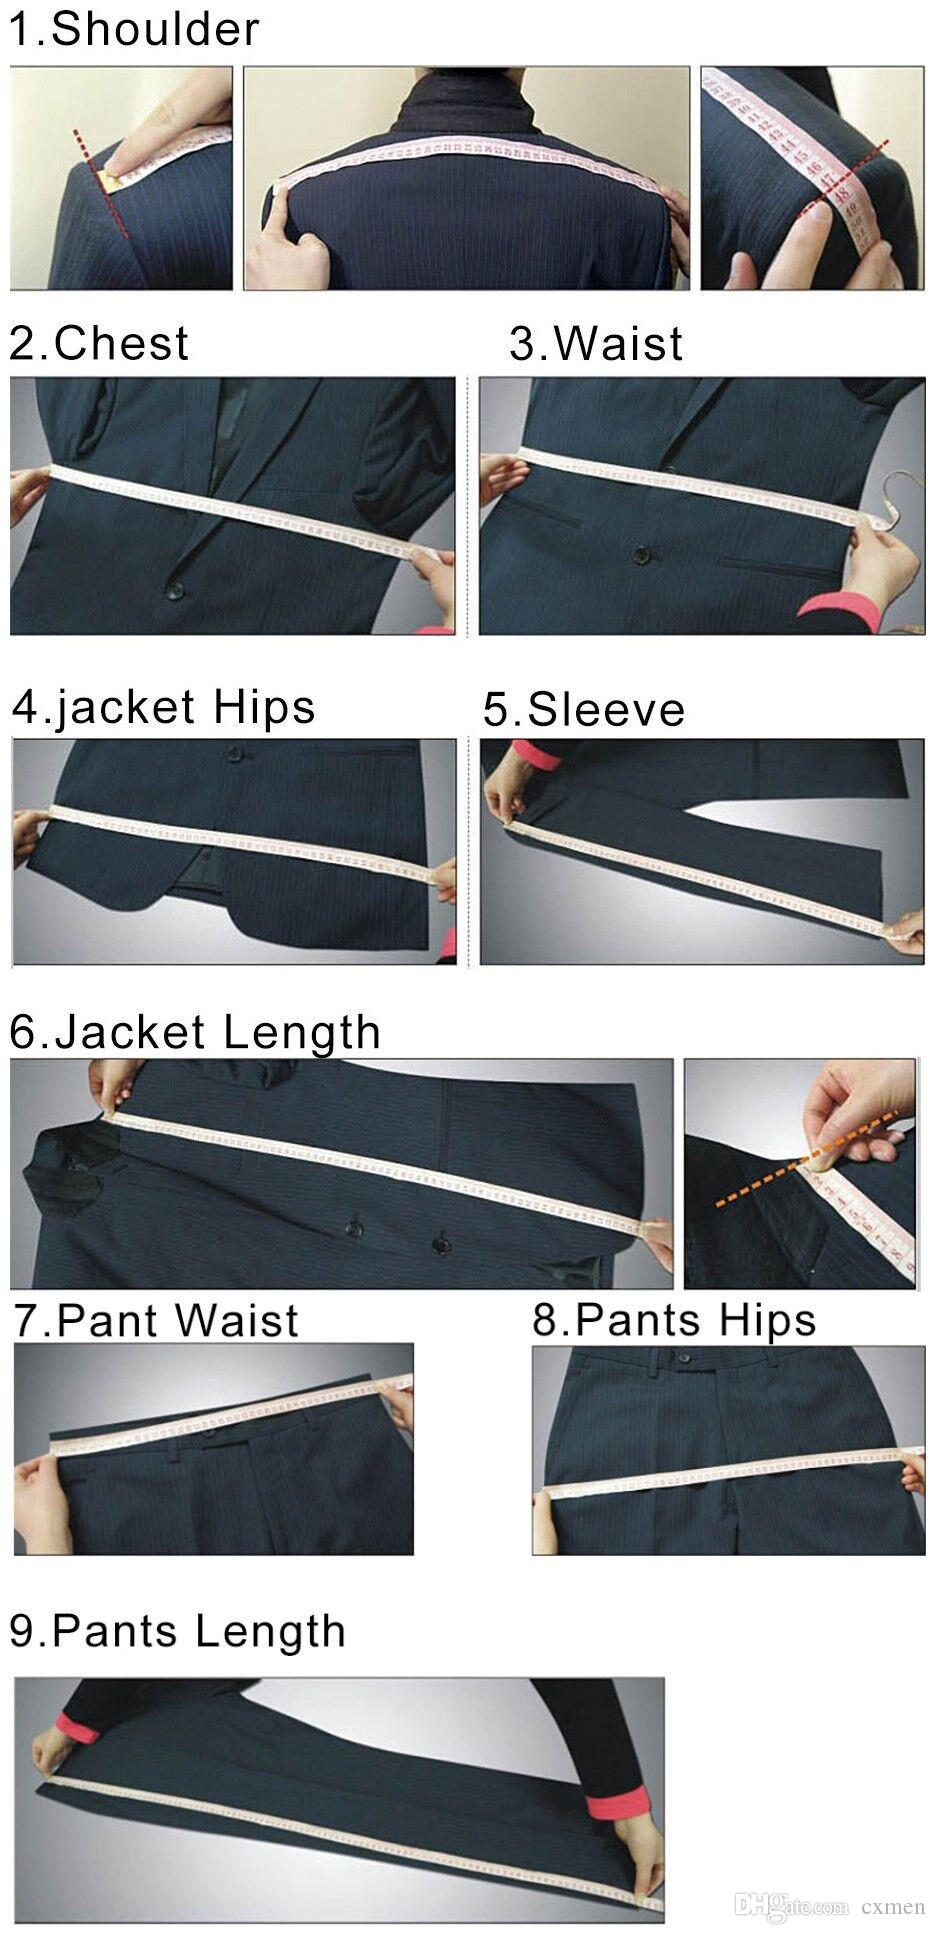 Black Tailcoat Men Suit Wedding Custom Made Groom Tuxedo Formal Male Blazer Slim Fit Groomsmen Bridegroom Suit Jacket+Pants+Vest